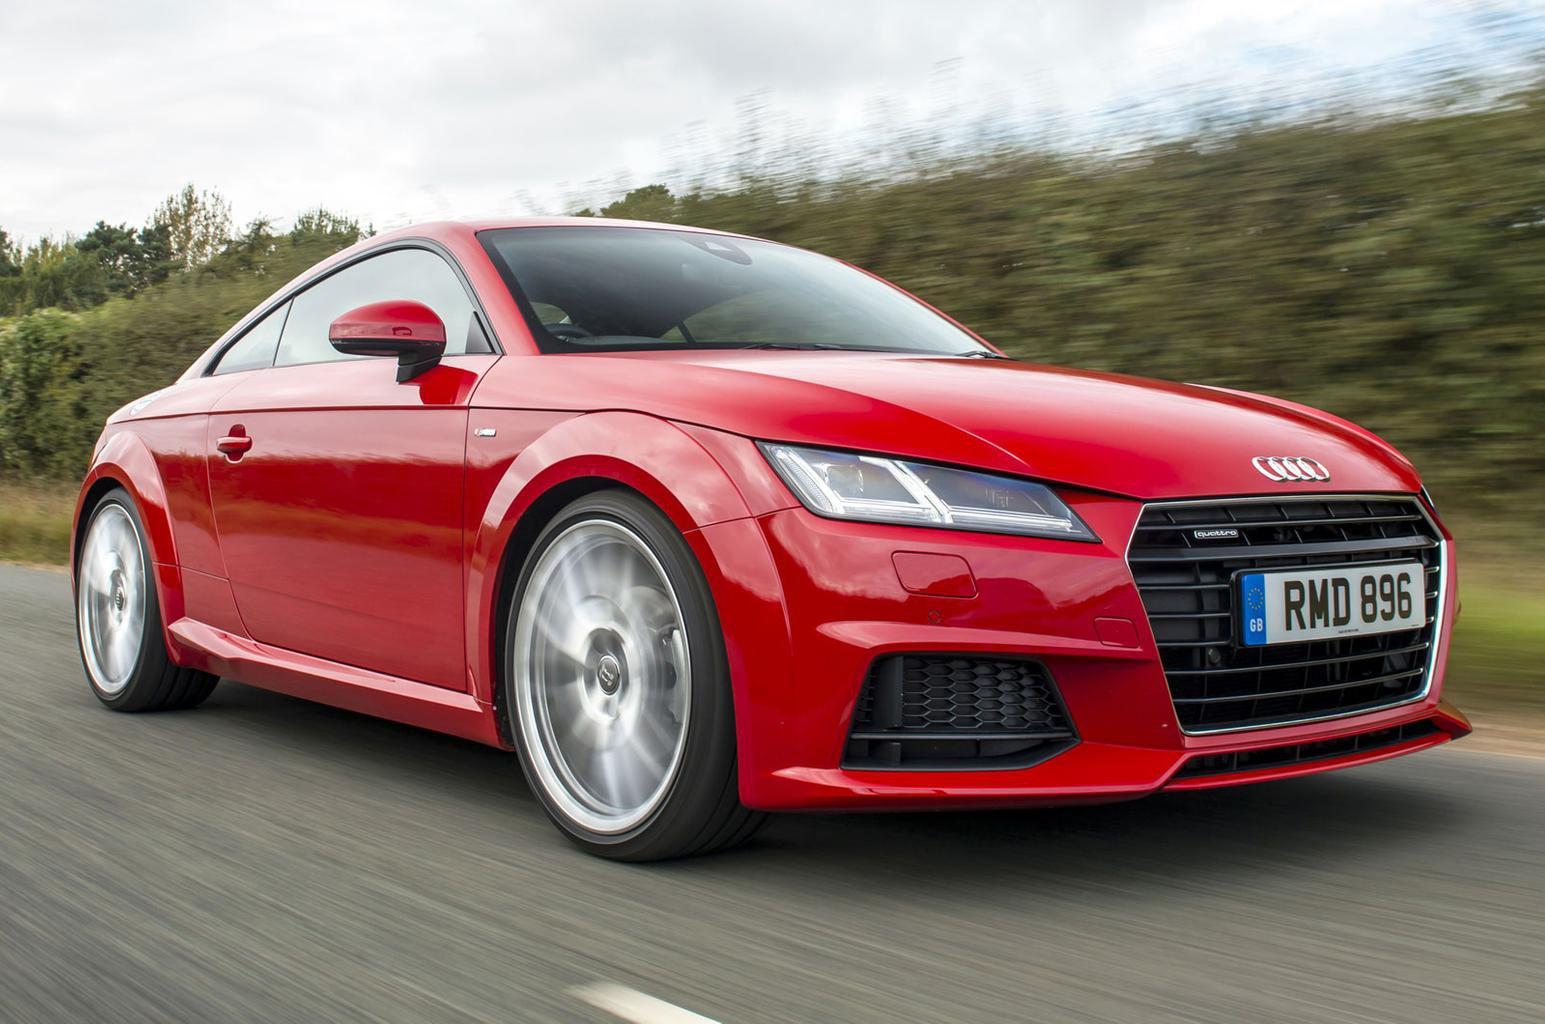 Audi TT scores four stars in Euro NCAP tests